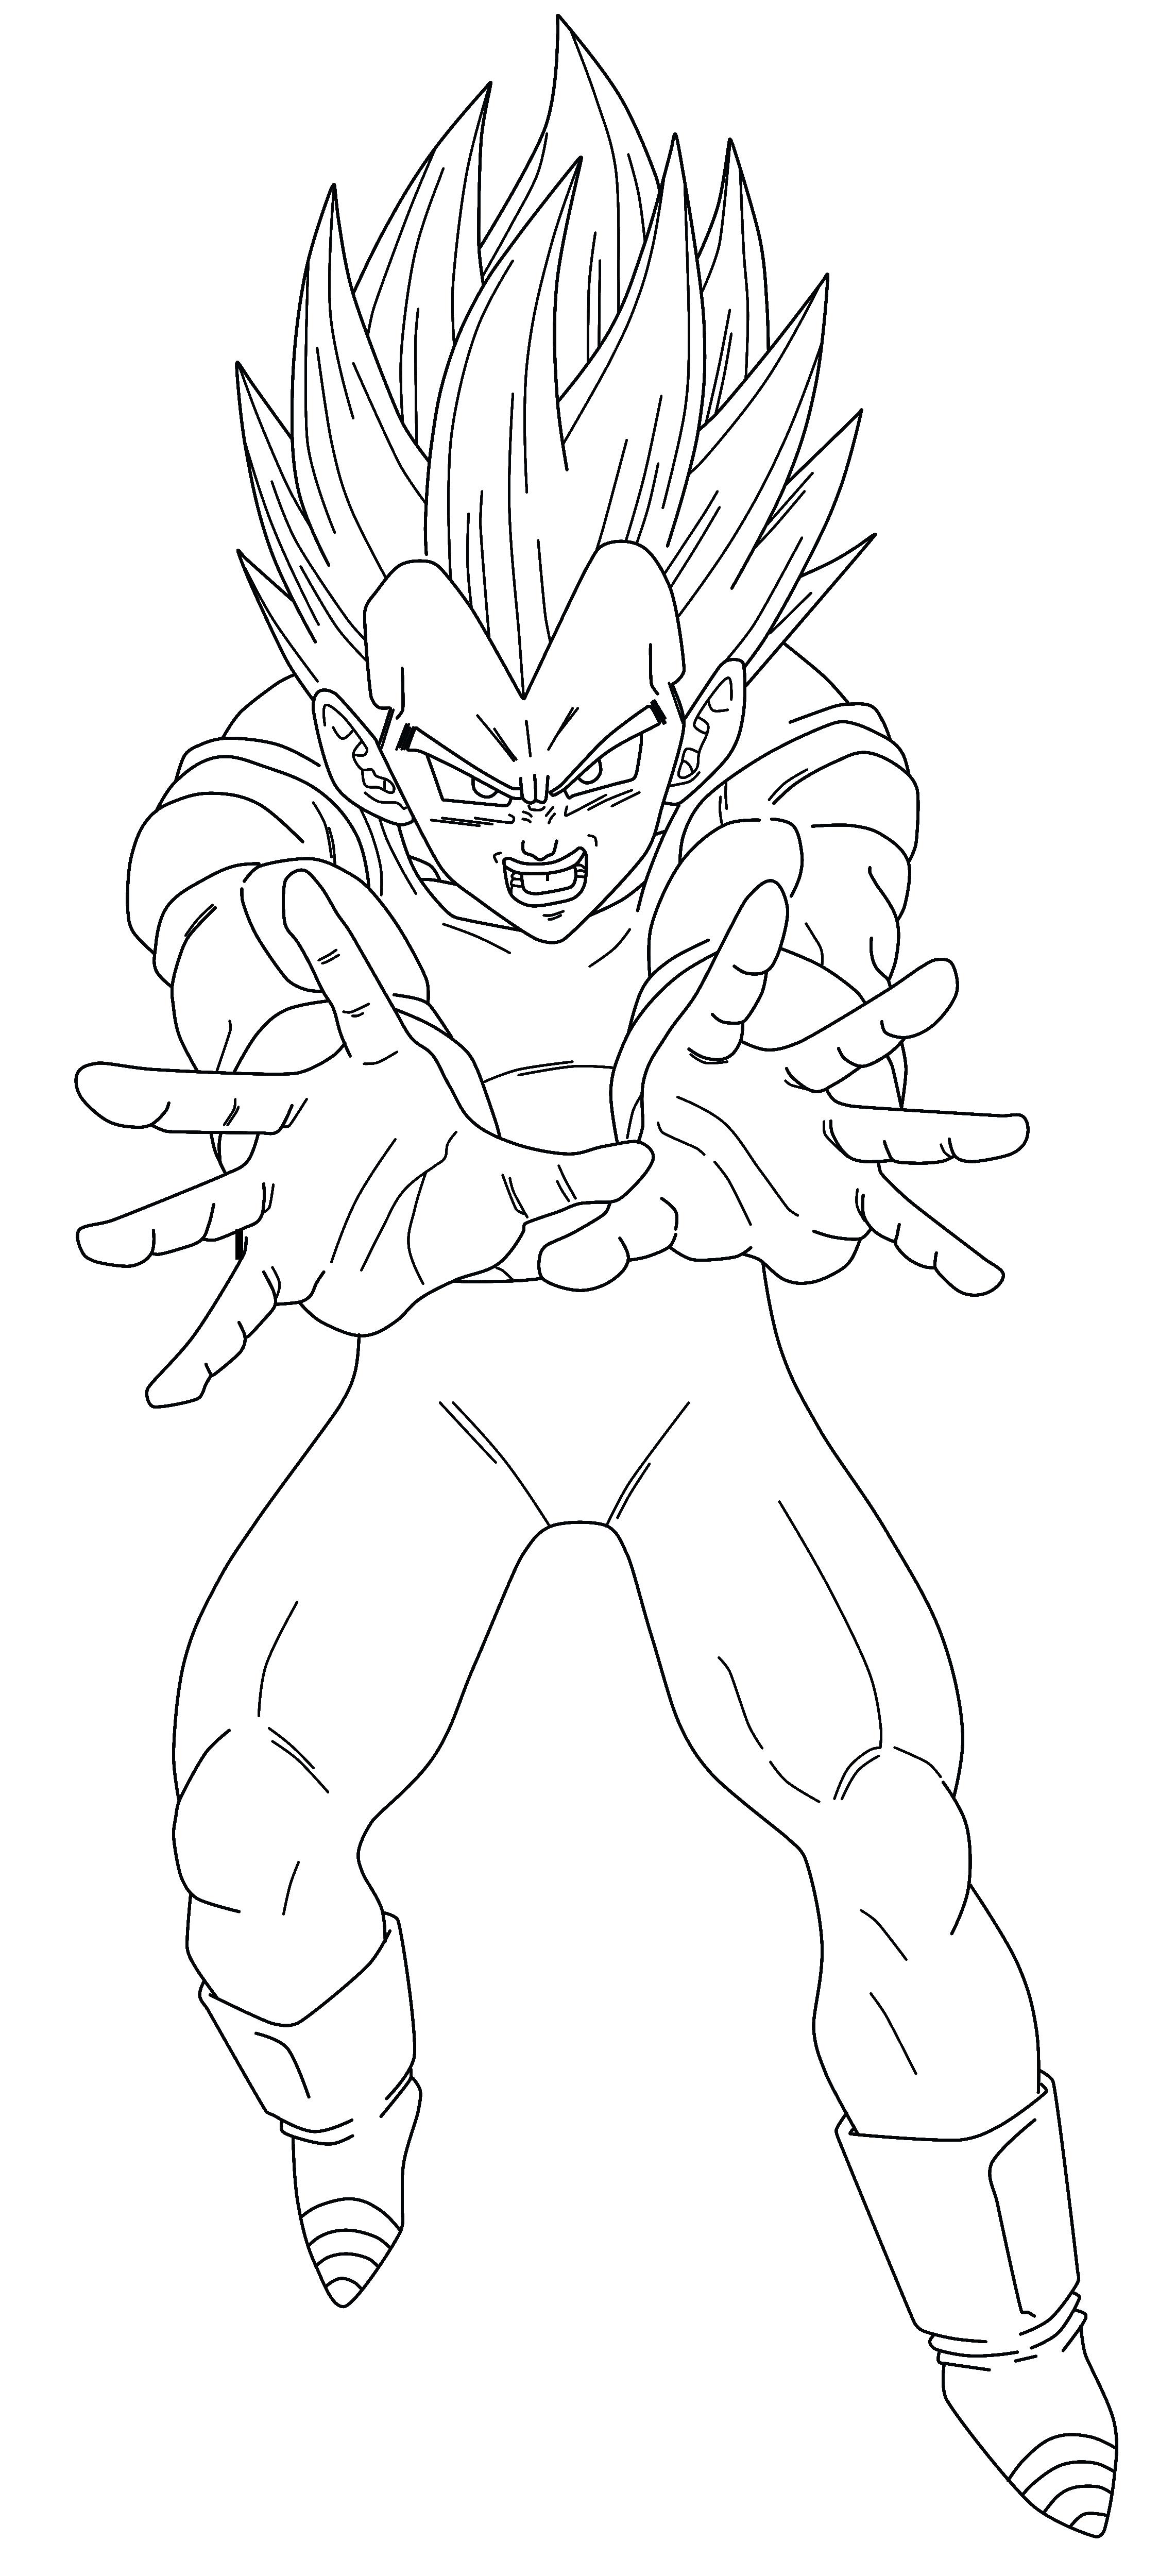 Line Drawing Png : Vegeta ssj line art png by tattydesigns on deviantart